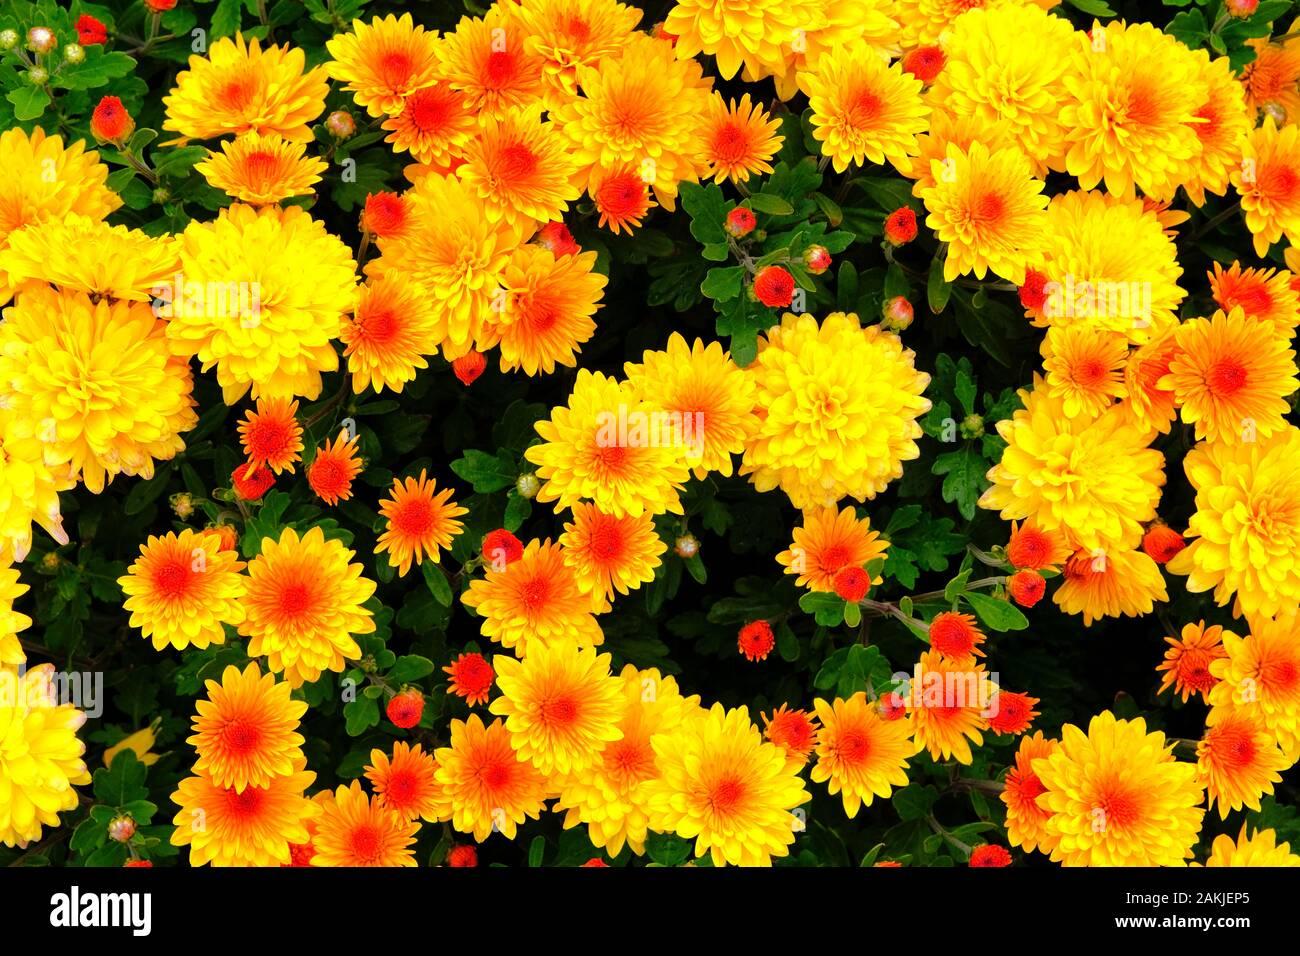 Orange And Yellow Chrysanthemums In Gardening Nursery Chrysanthemums Wallpaper Floral Bright Blooming Background Close Up Stock Photo Alamy